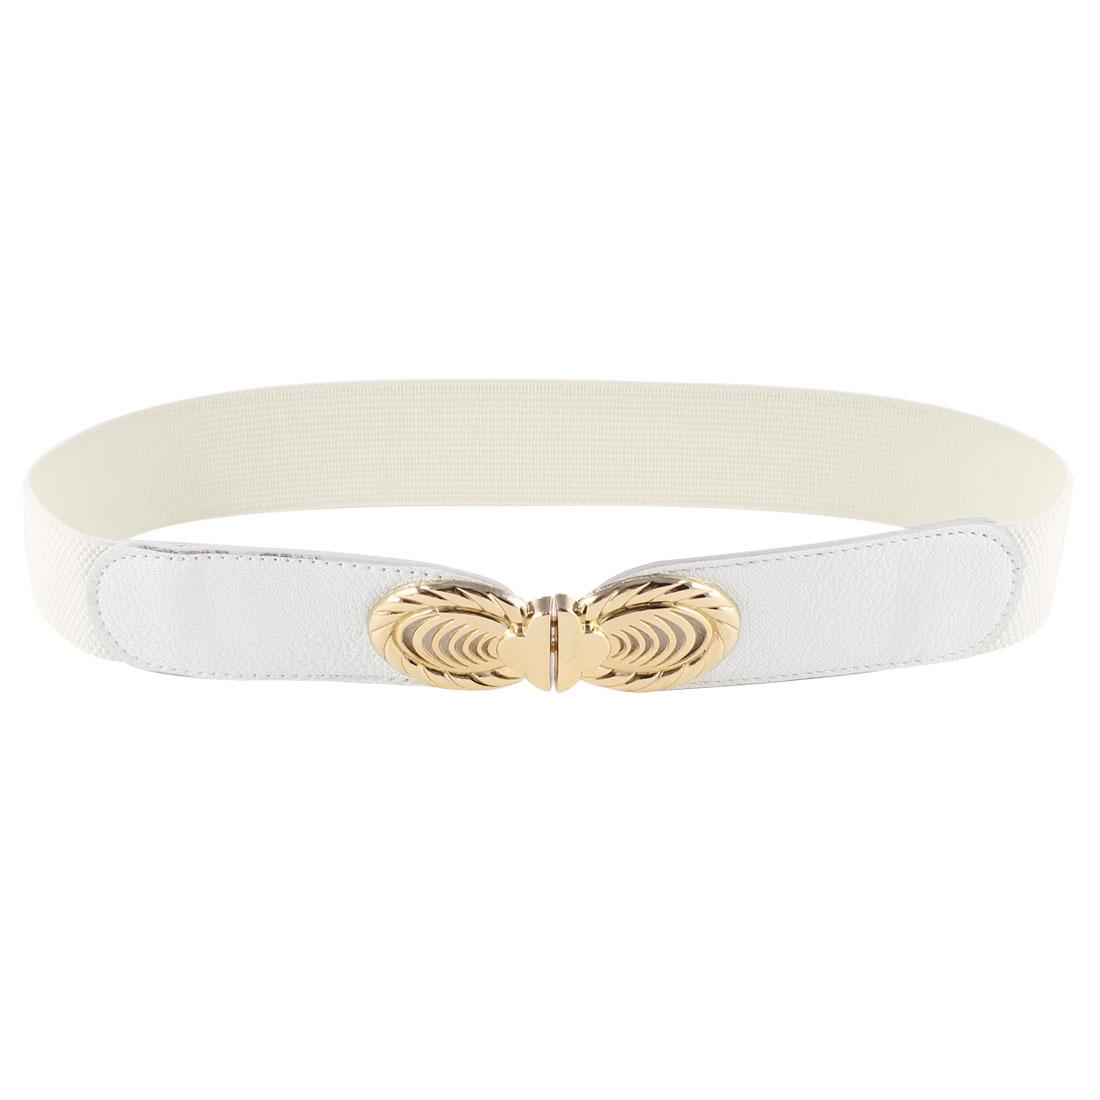 White Gold Tone Oval Interlock Closure Elastic Waistband Skinny Belt for Ladies